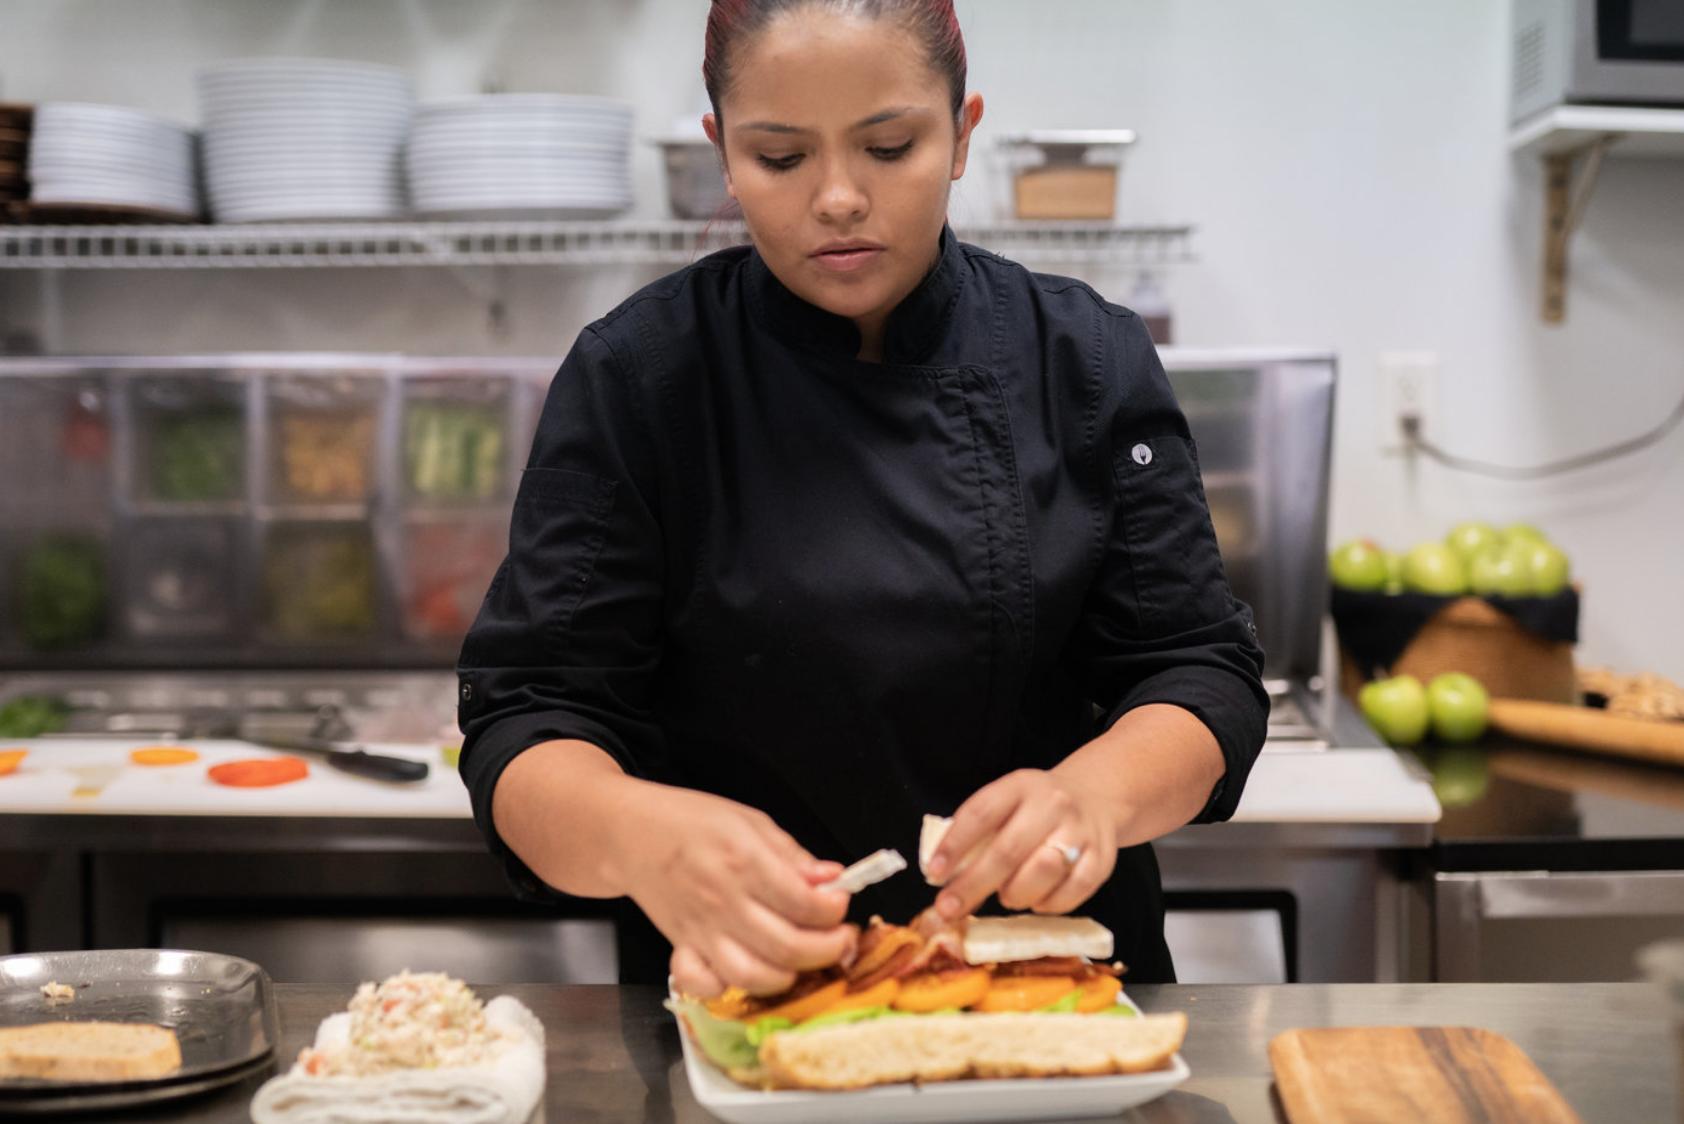 La Jolla Restaurant and Bar Female Chef